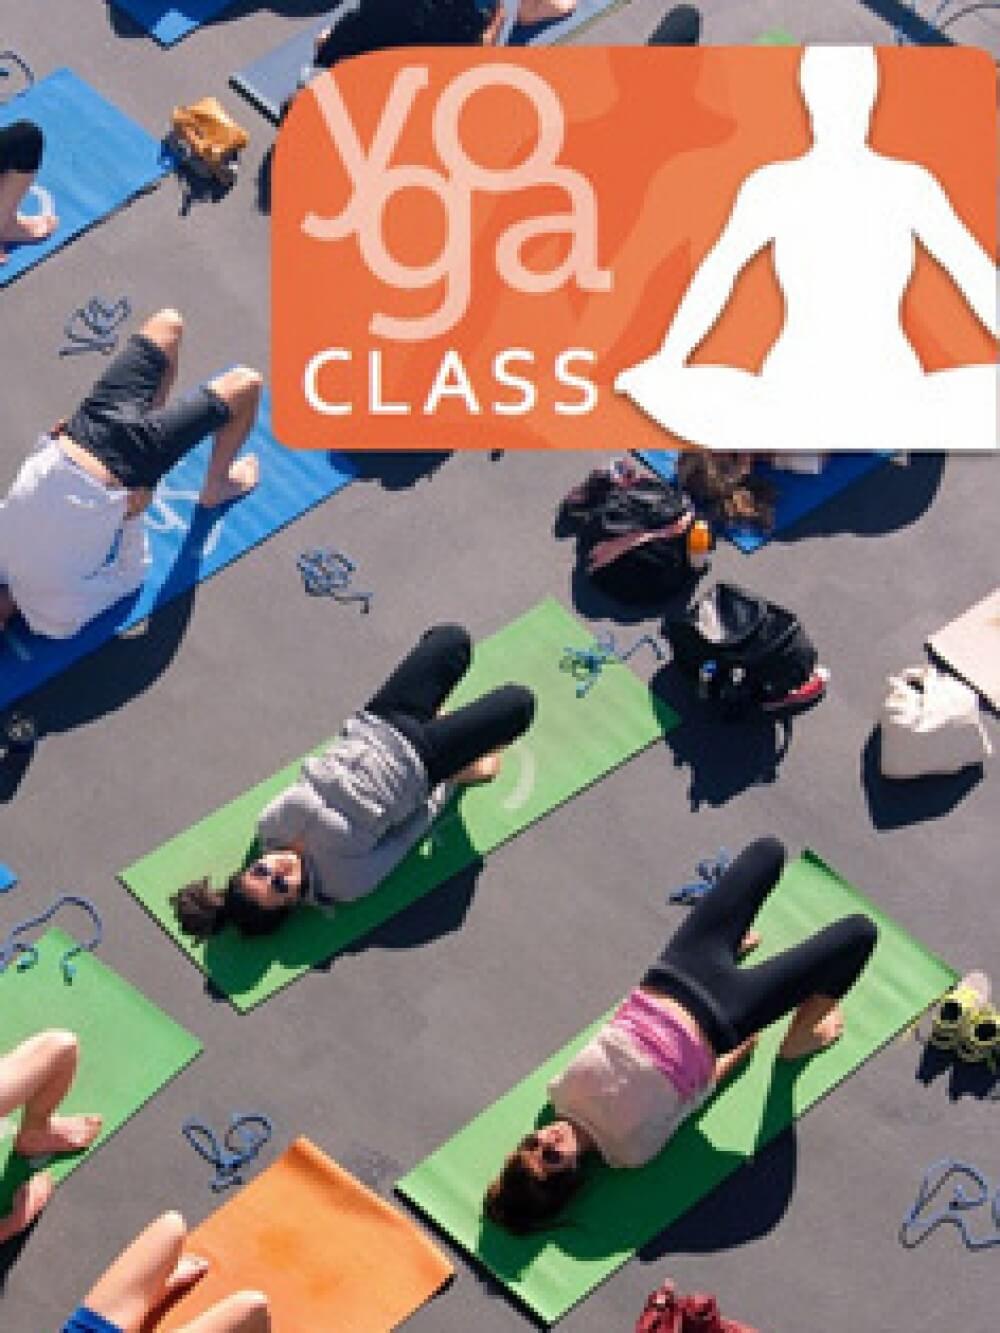 yoga_class_vertical_web